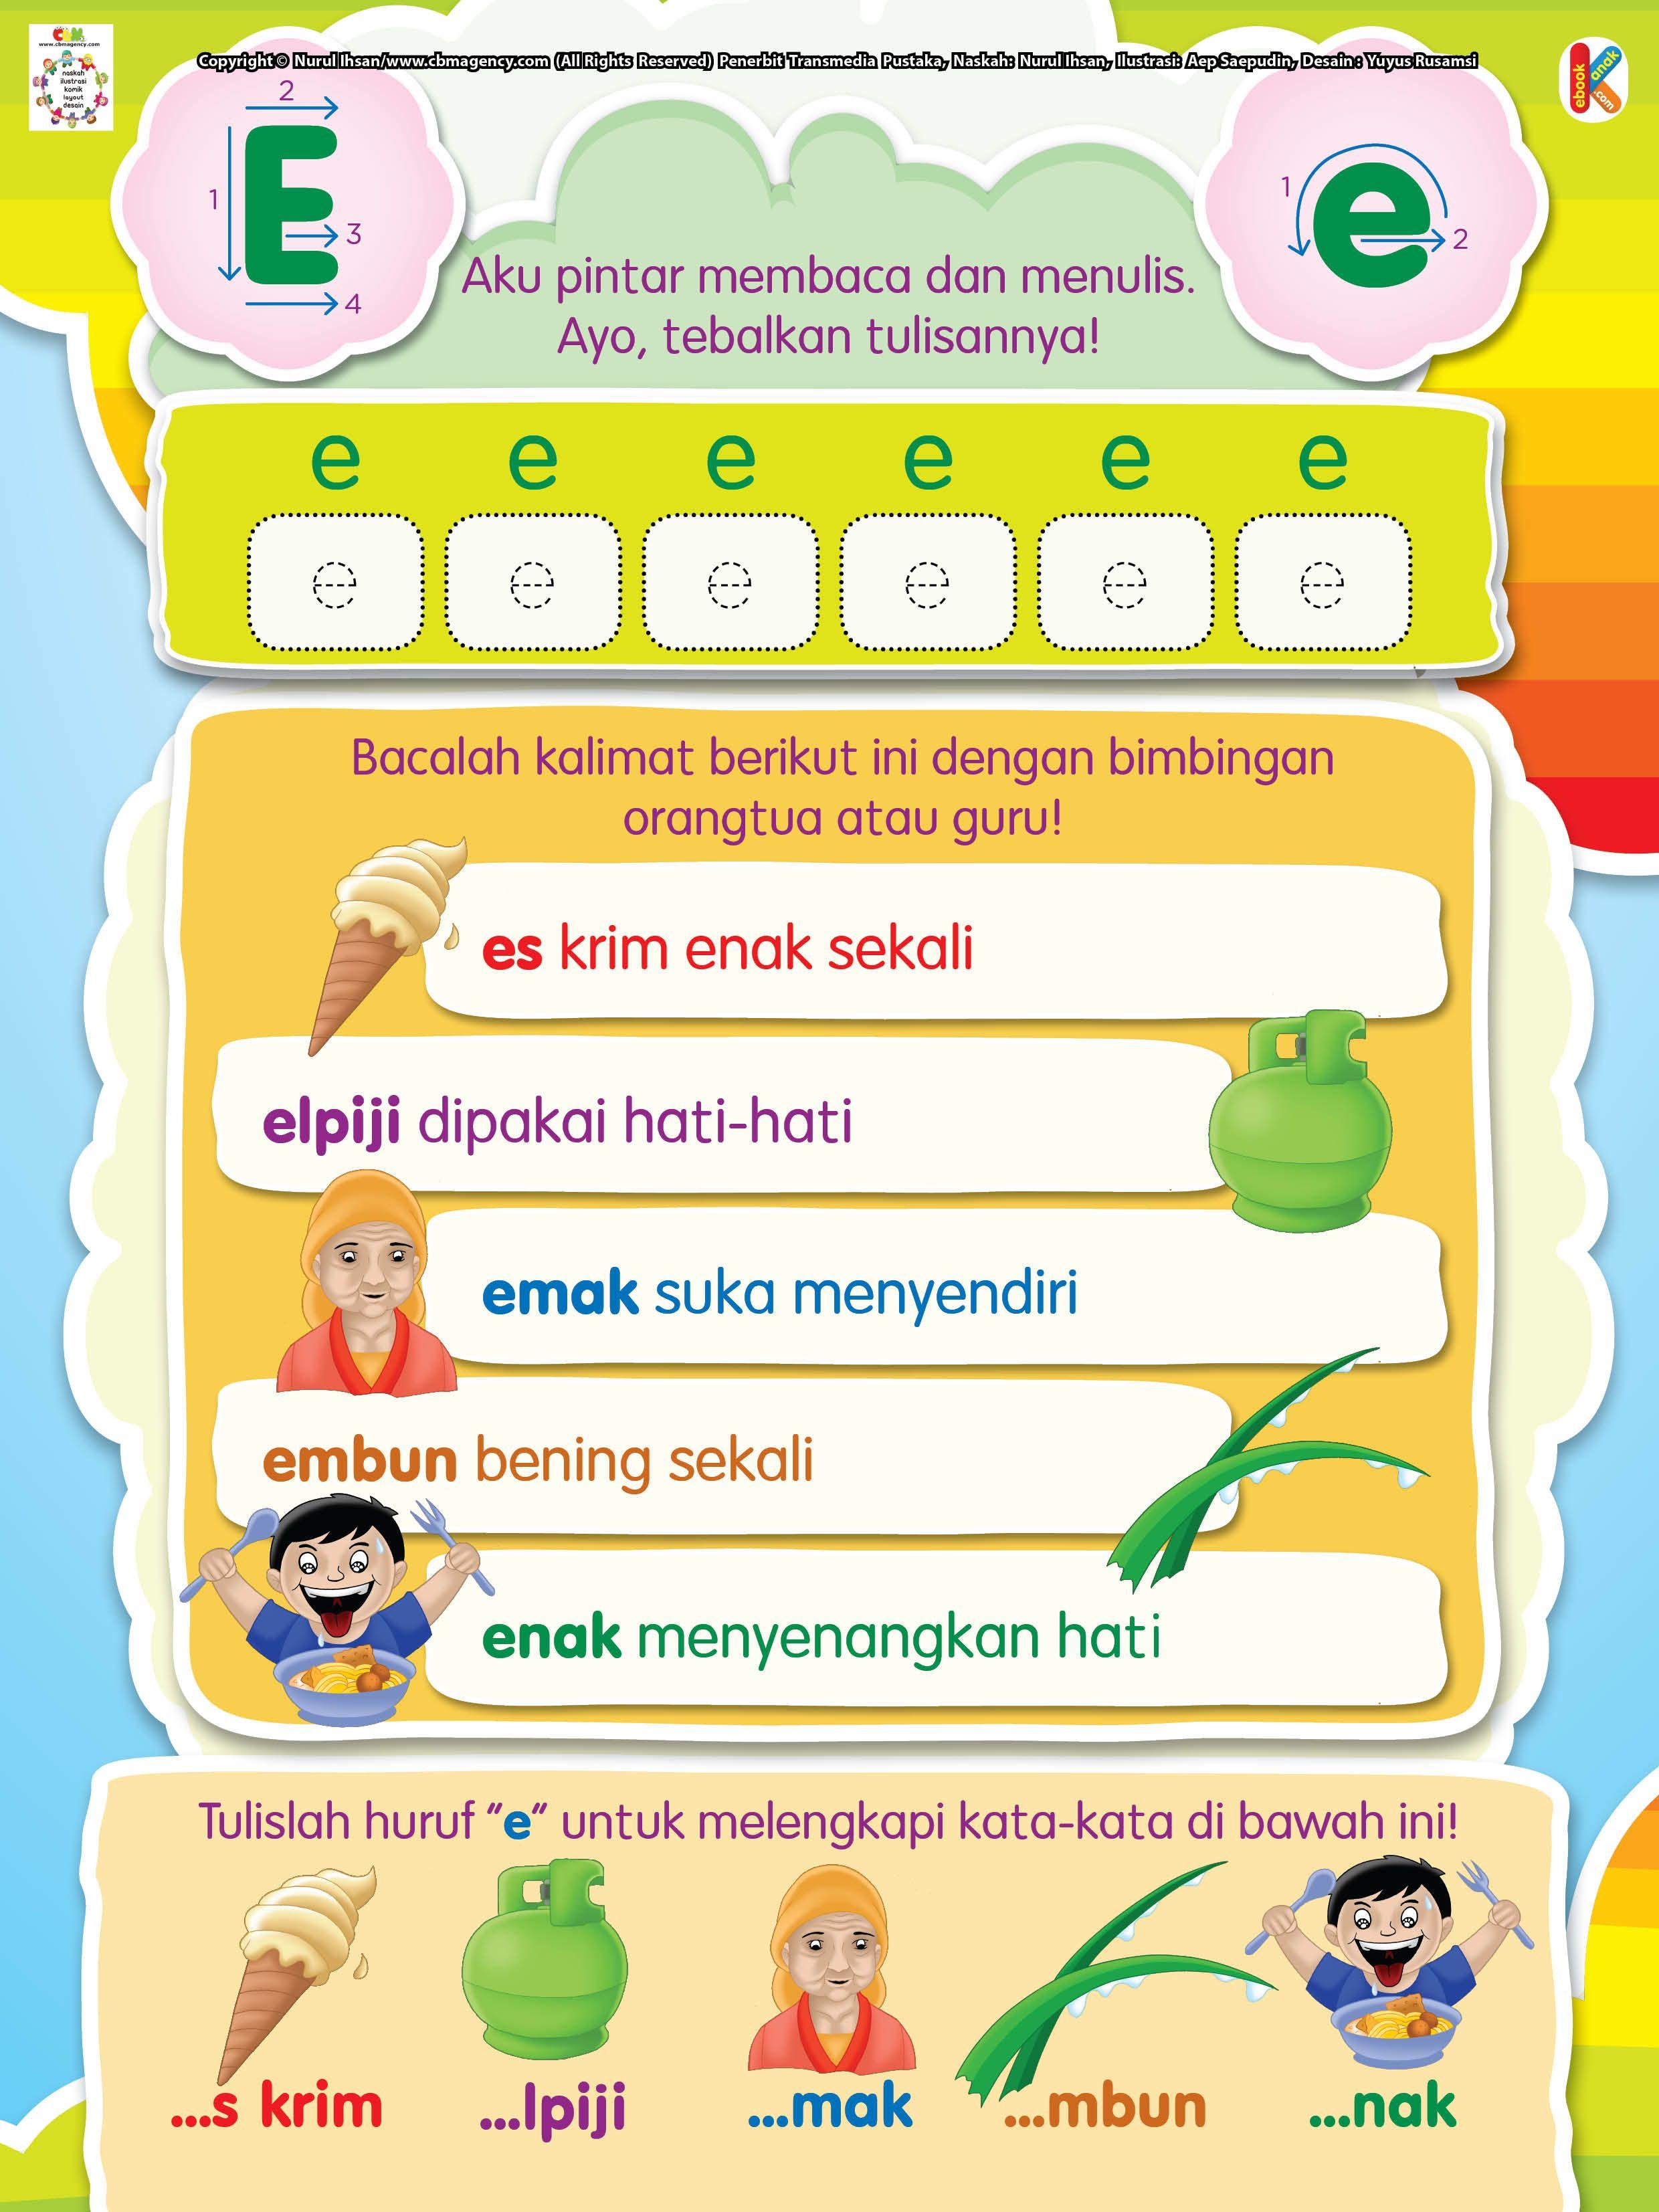 Pintar Membaca Dan Menulis Huruf E Membaca Panduan Belajar Belajar Ejaan